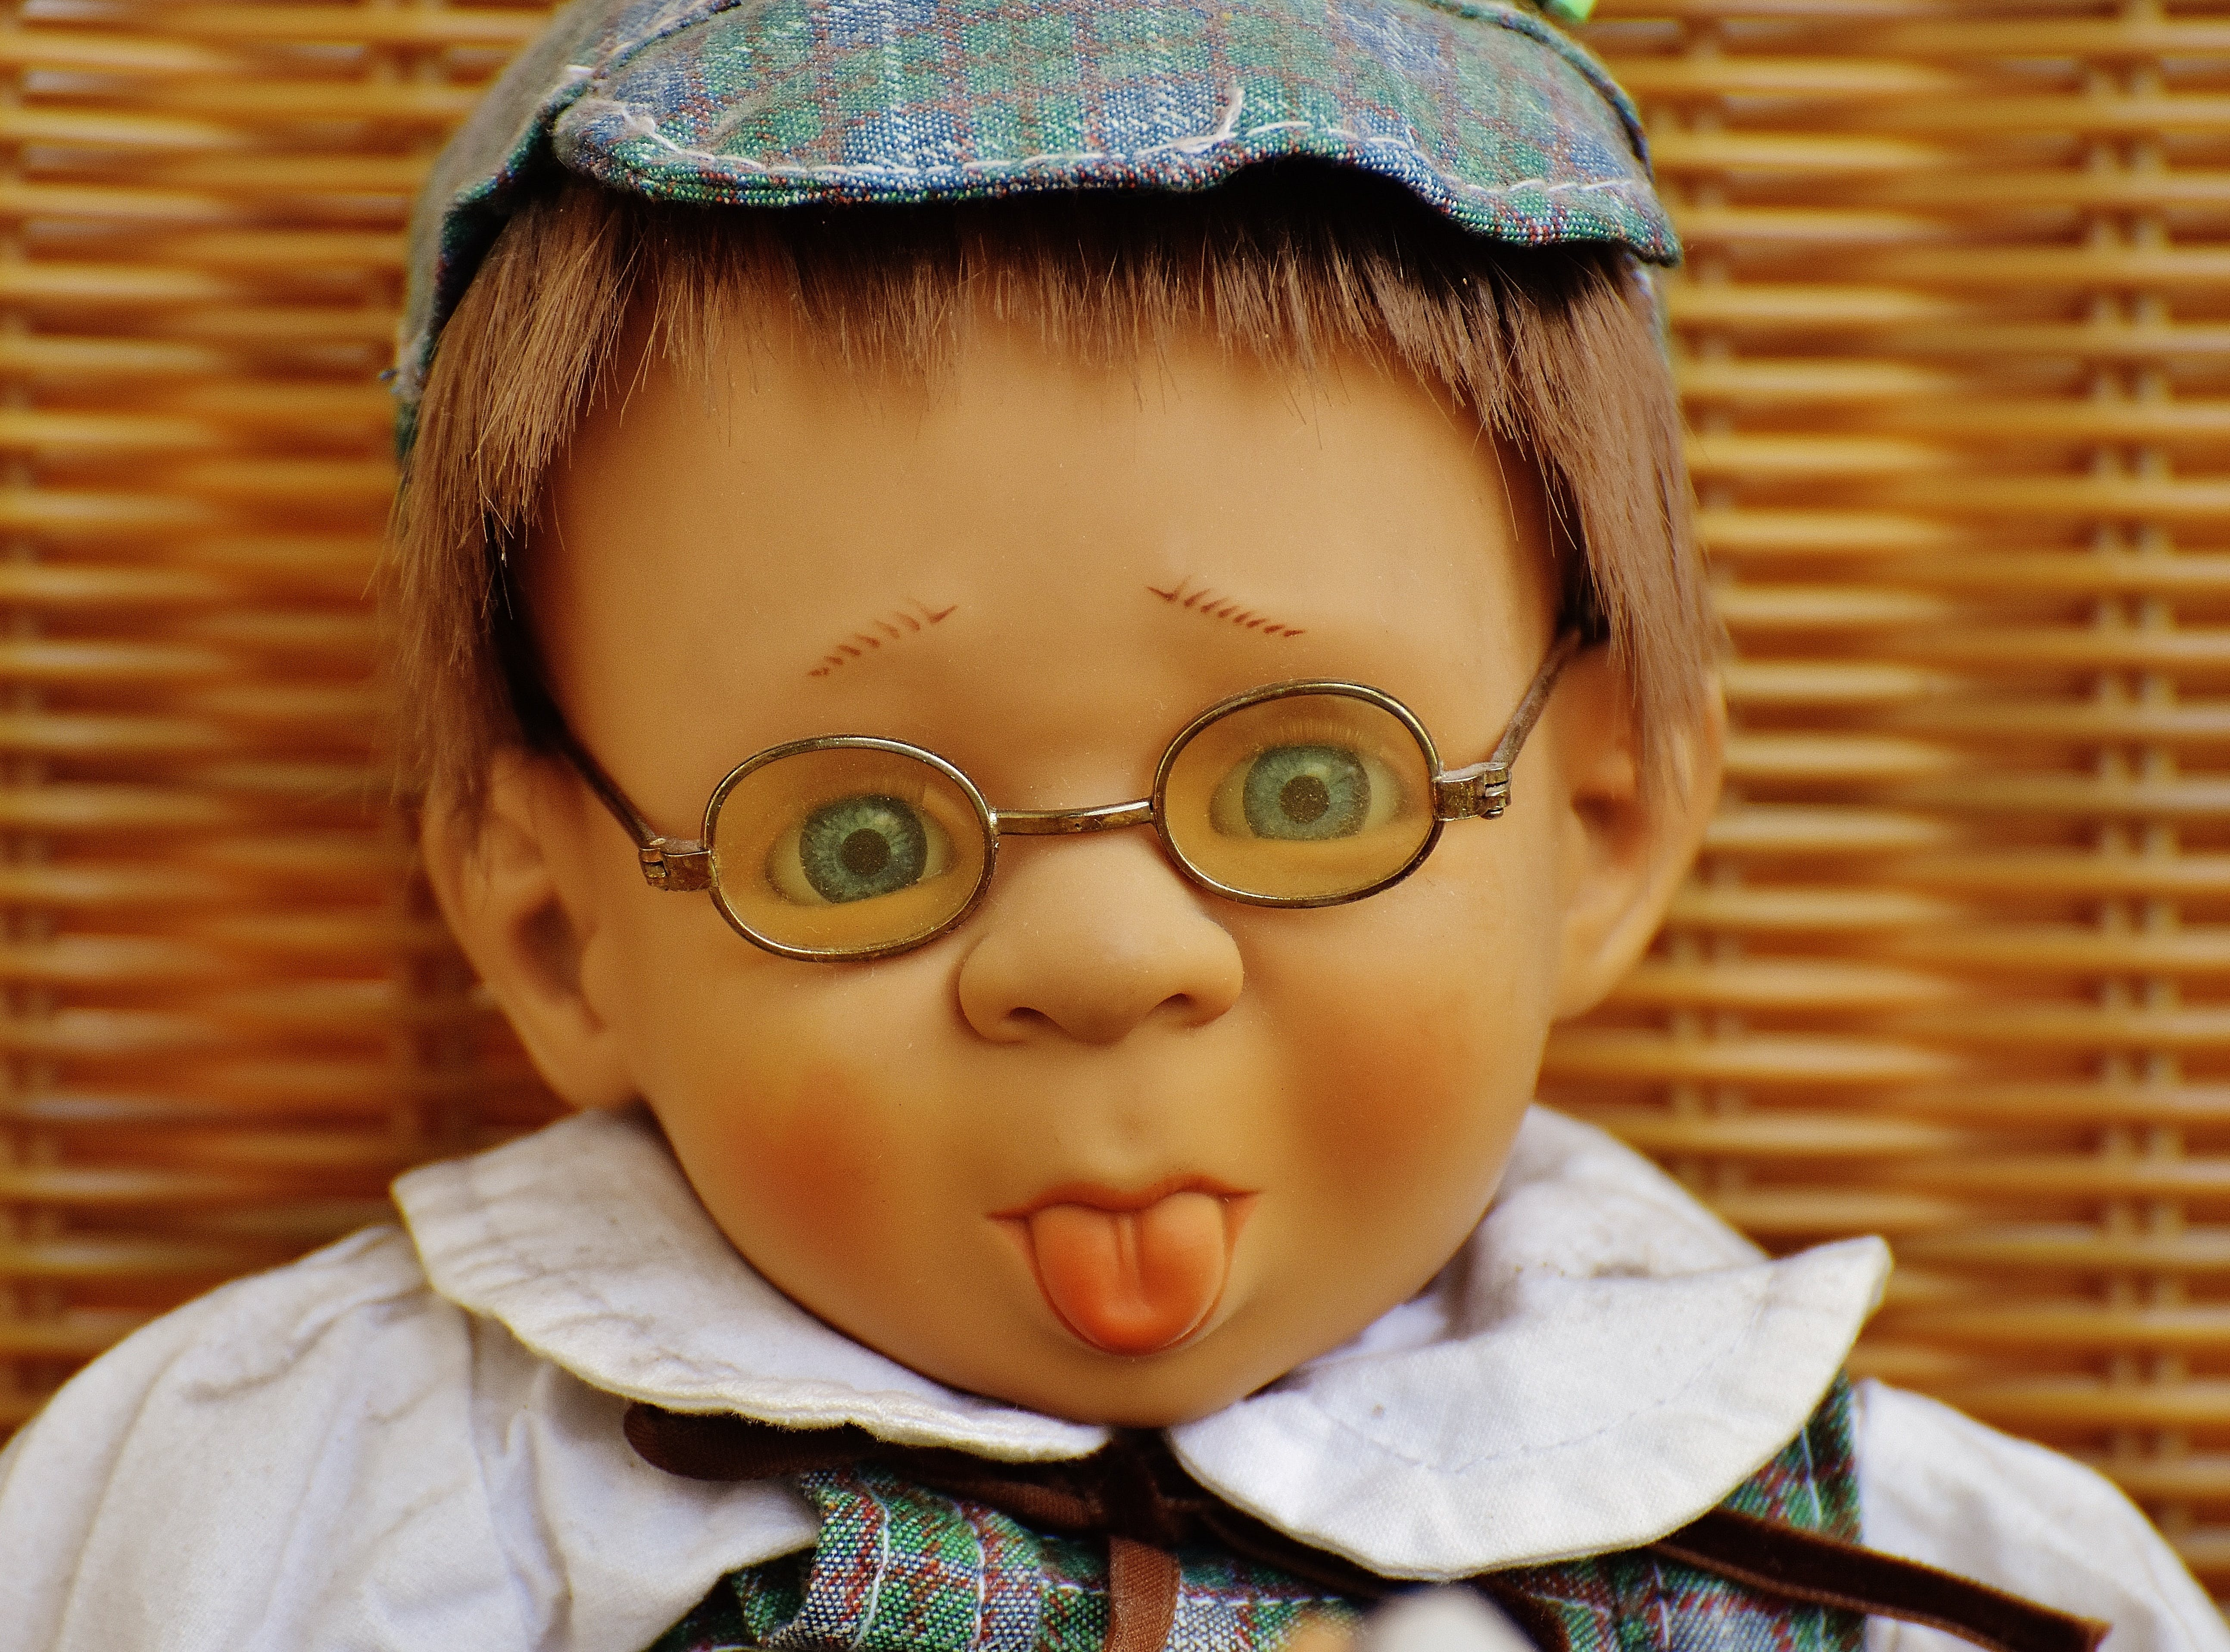 Fotos de stock gratuitas de adentro, adorable, bebé, chaval